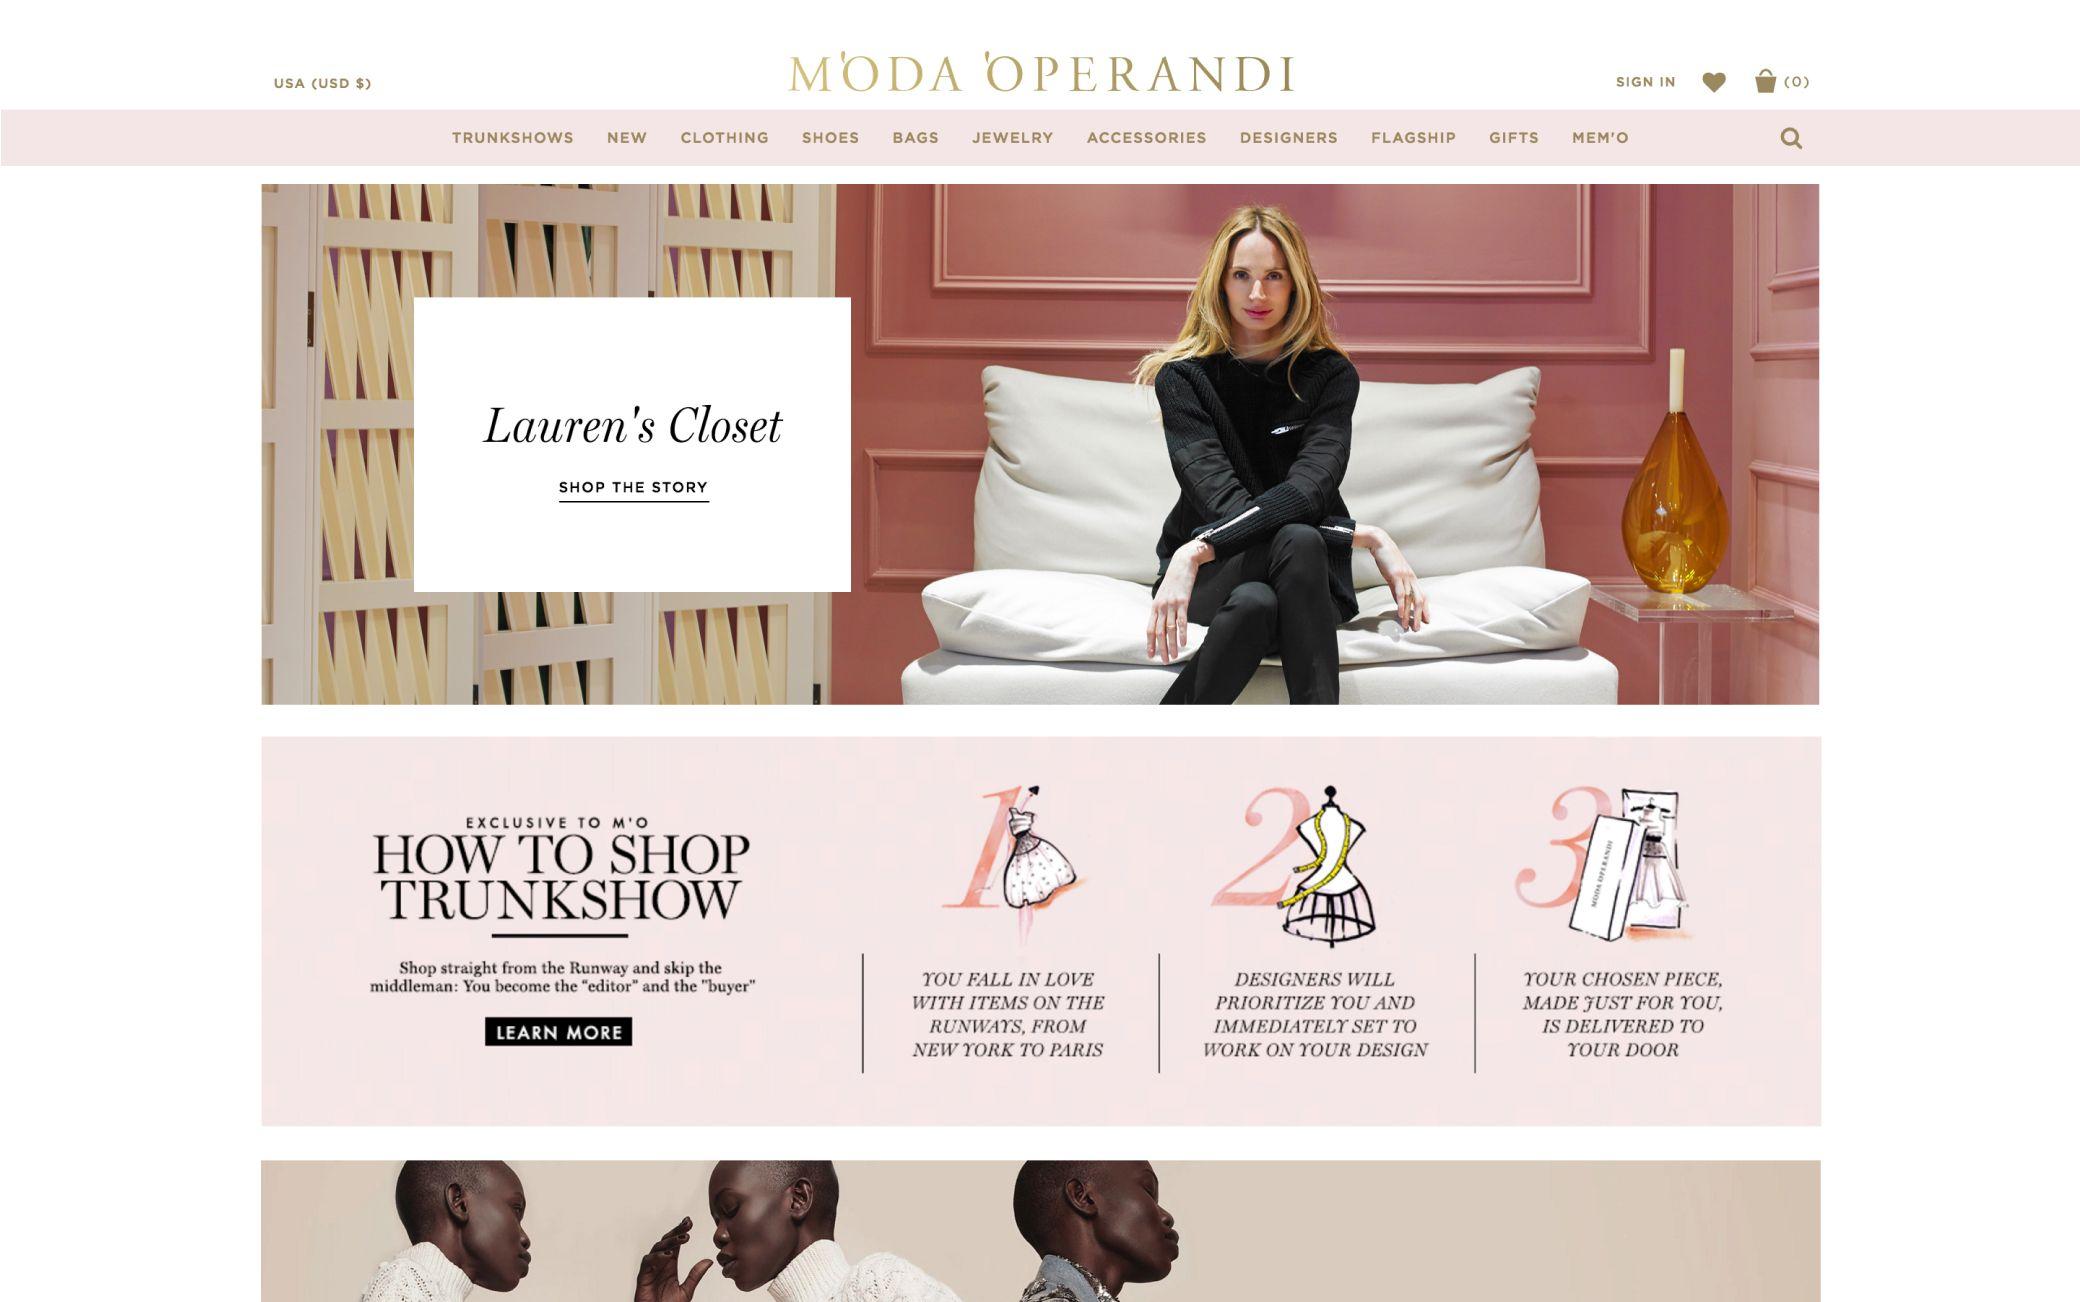 moda-operandi screenshot